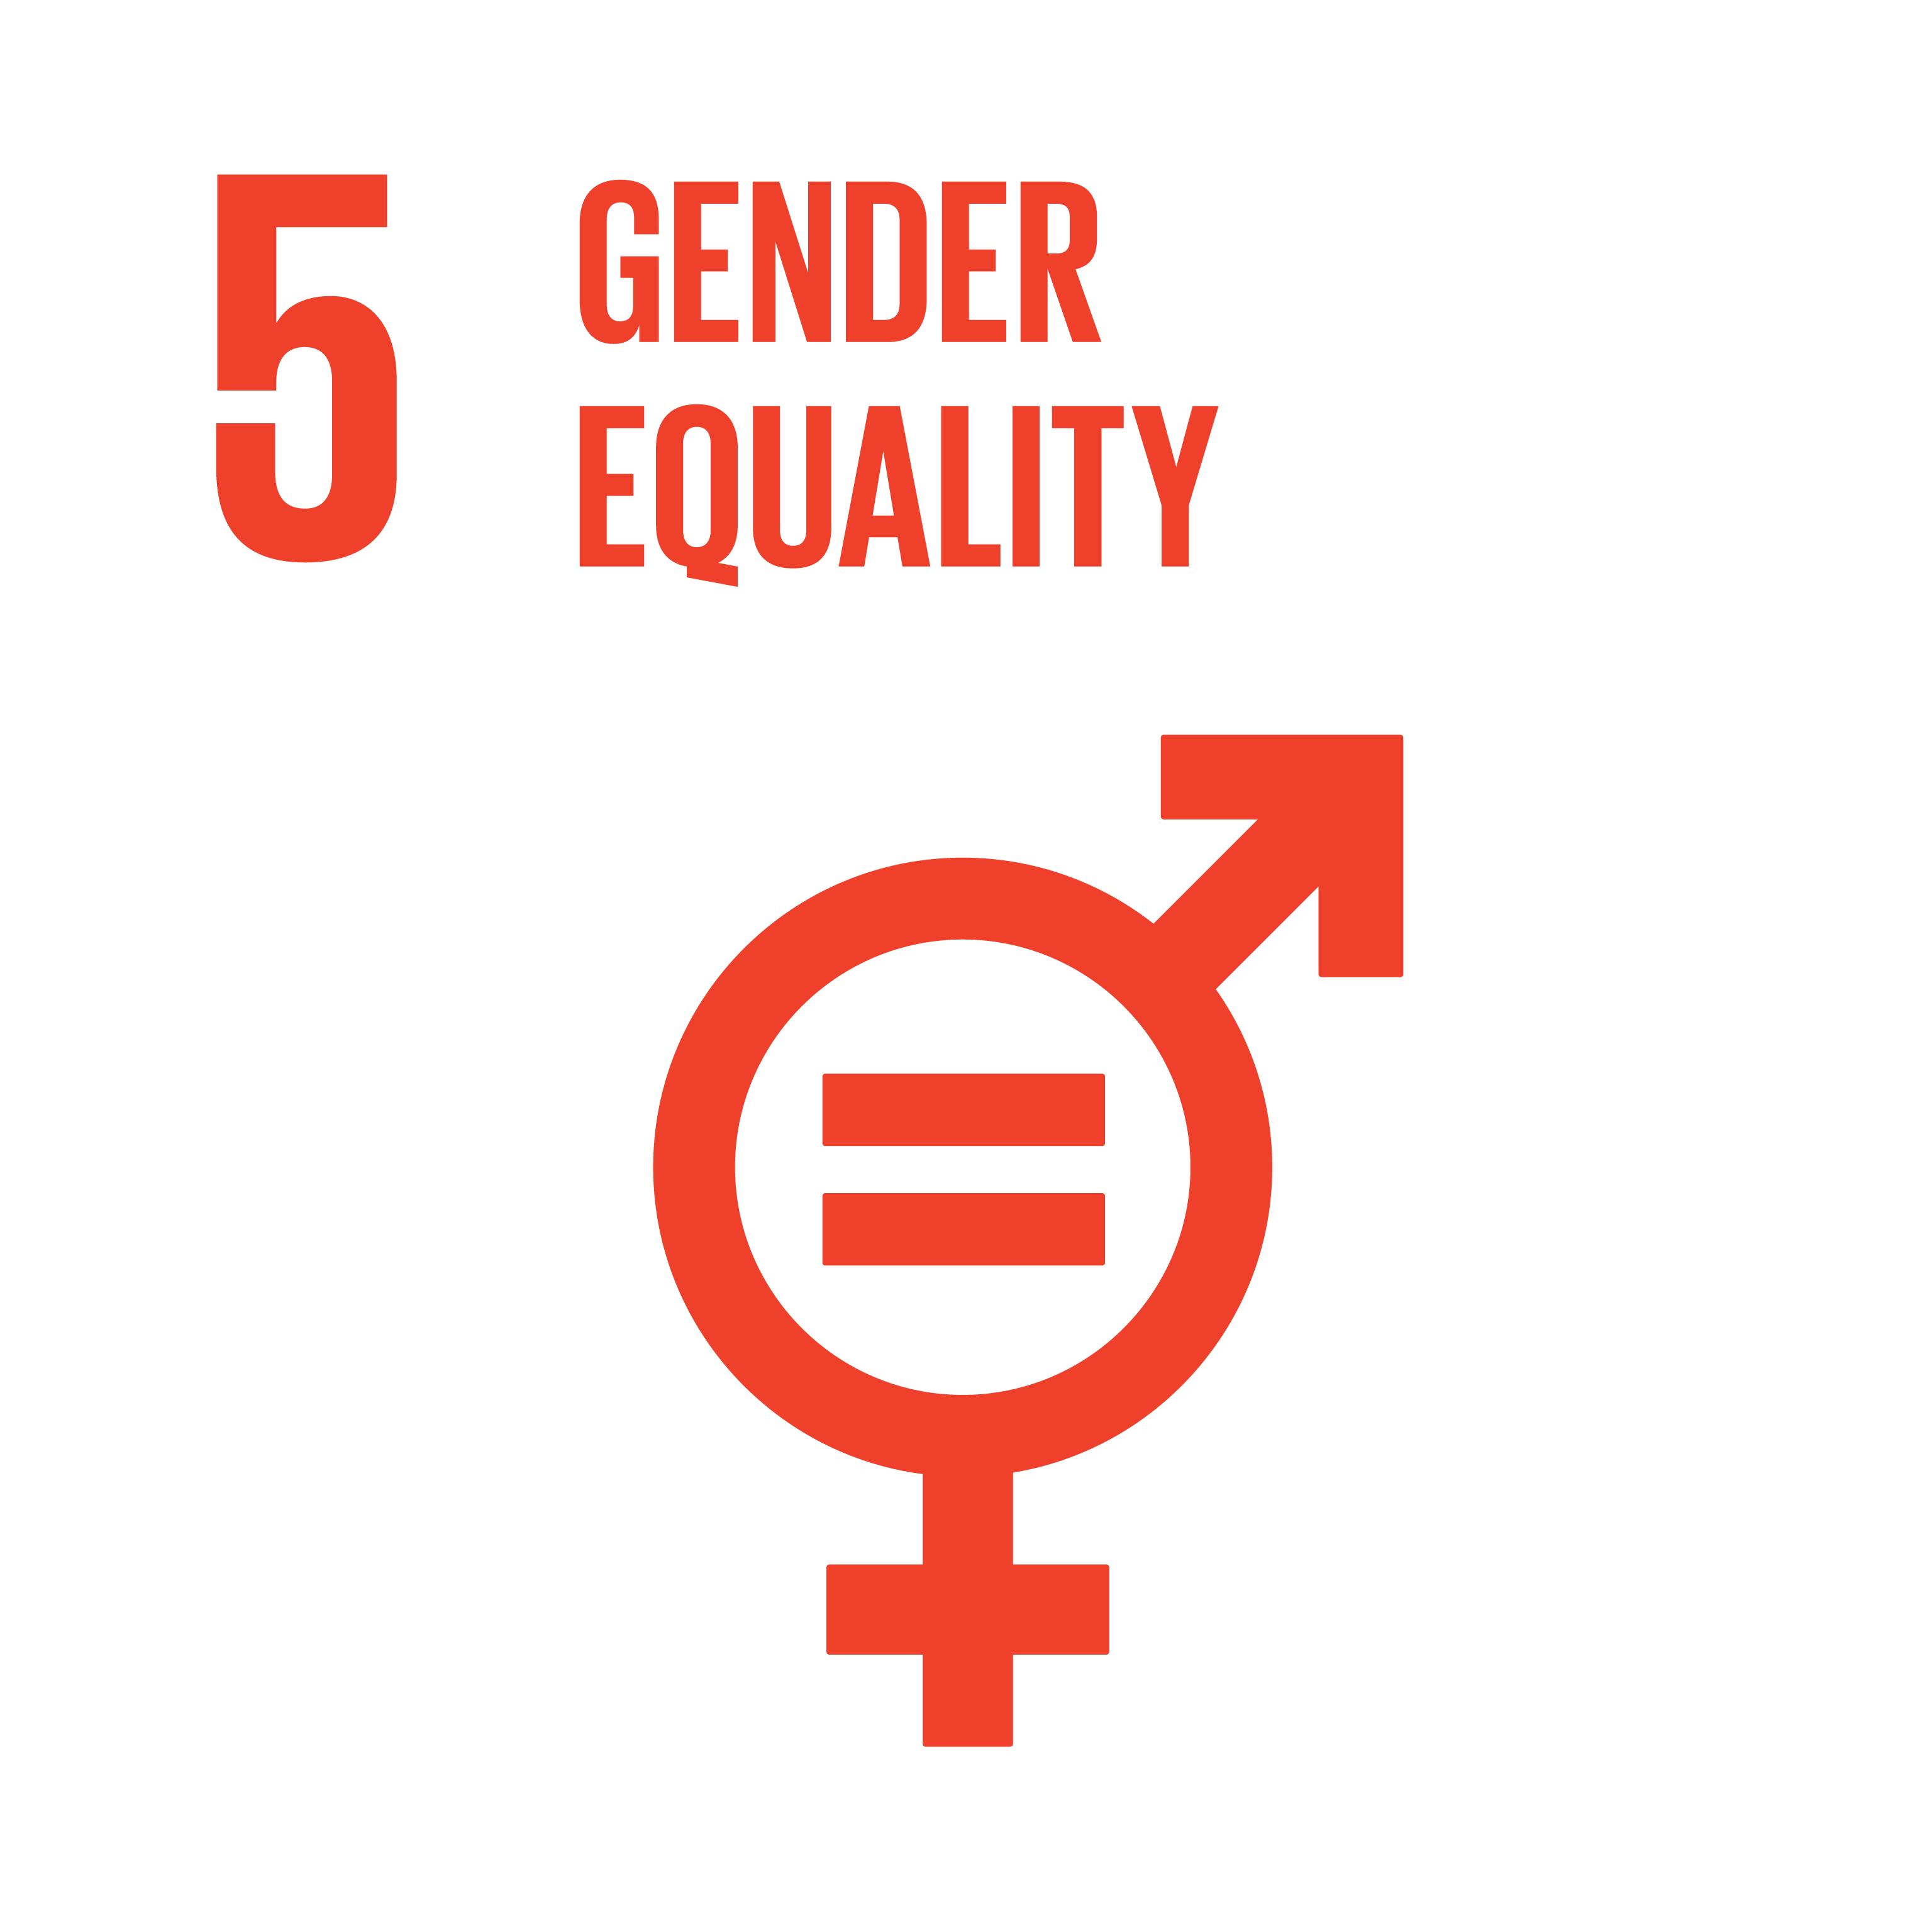 E_INVERTED SDG goals_icons-individual-RGB-05